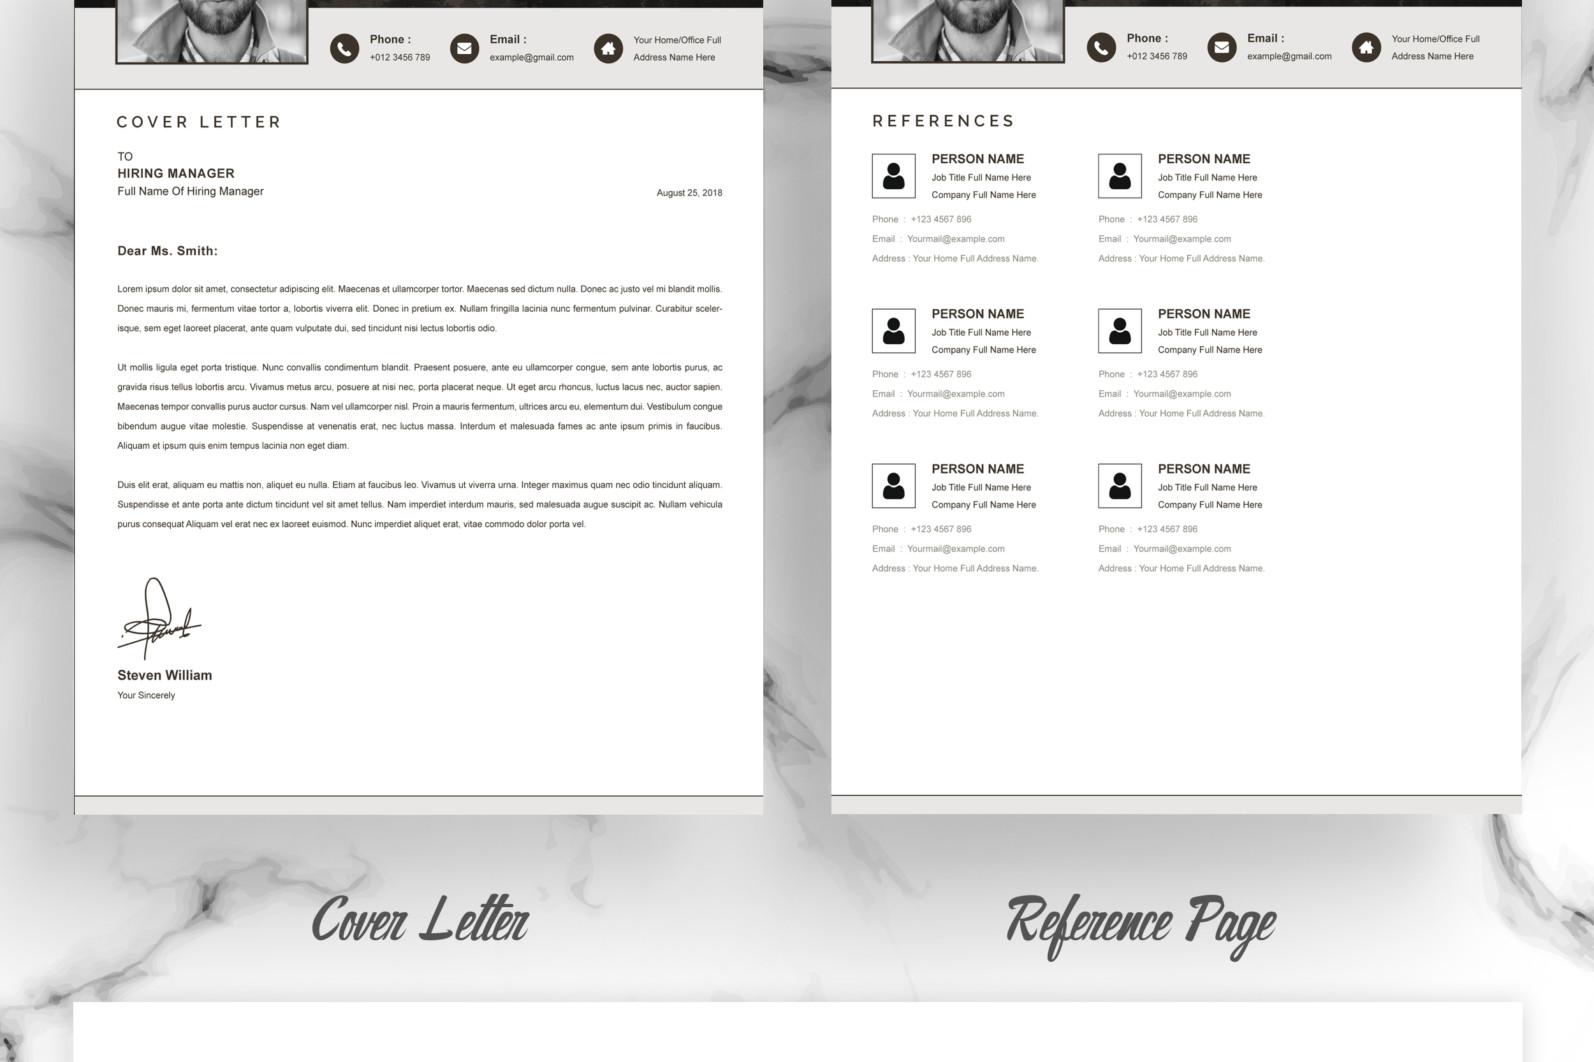 Professional Resume, Instant Download - 03 Resume Template MS Word Free Resume CV Design 6 -